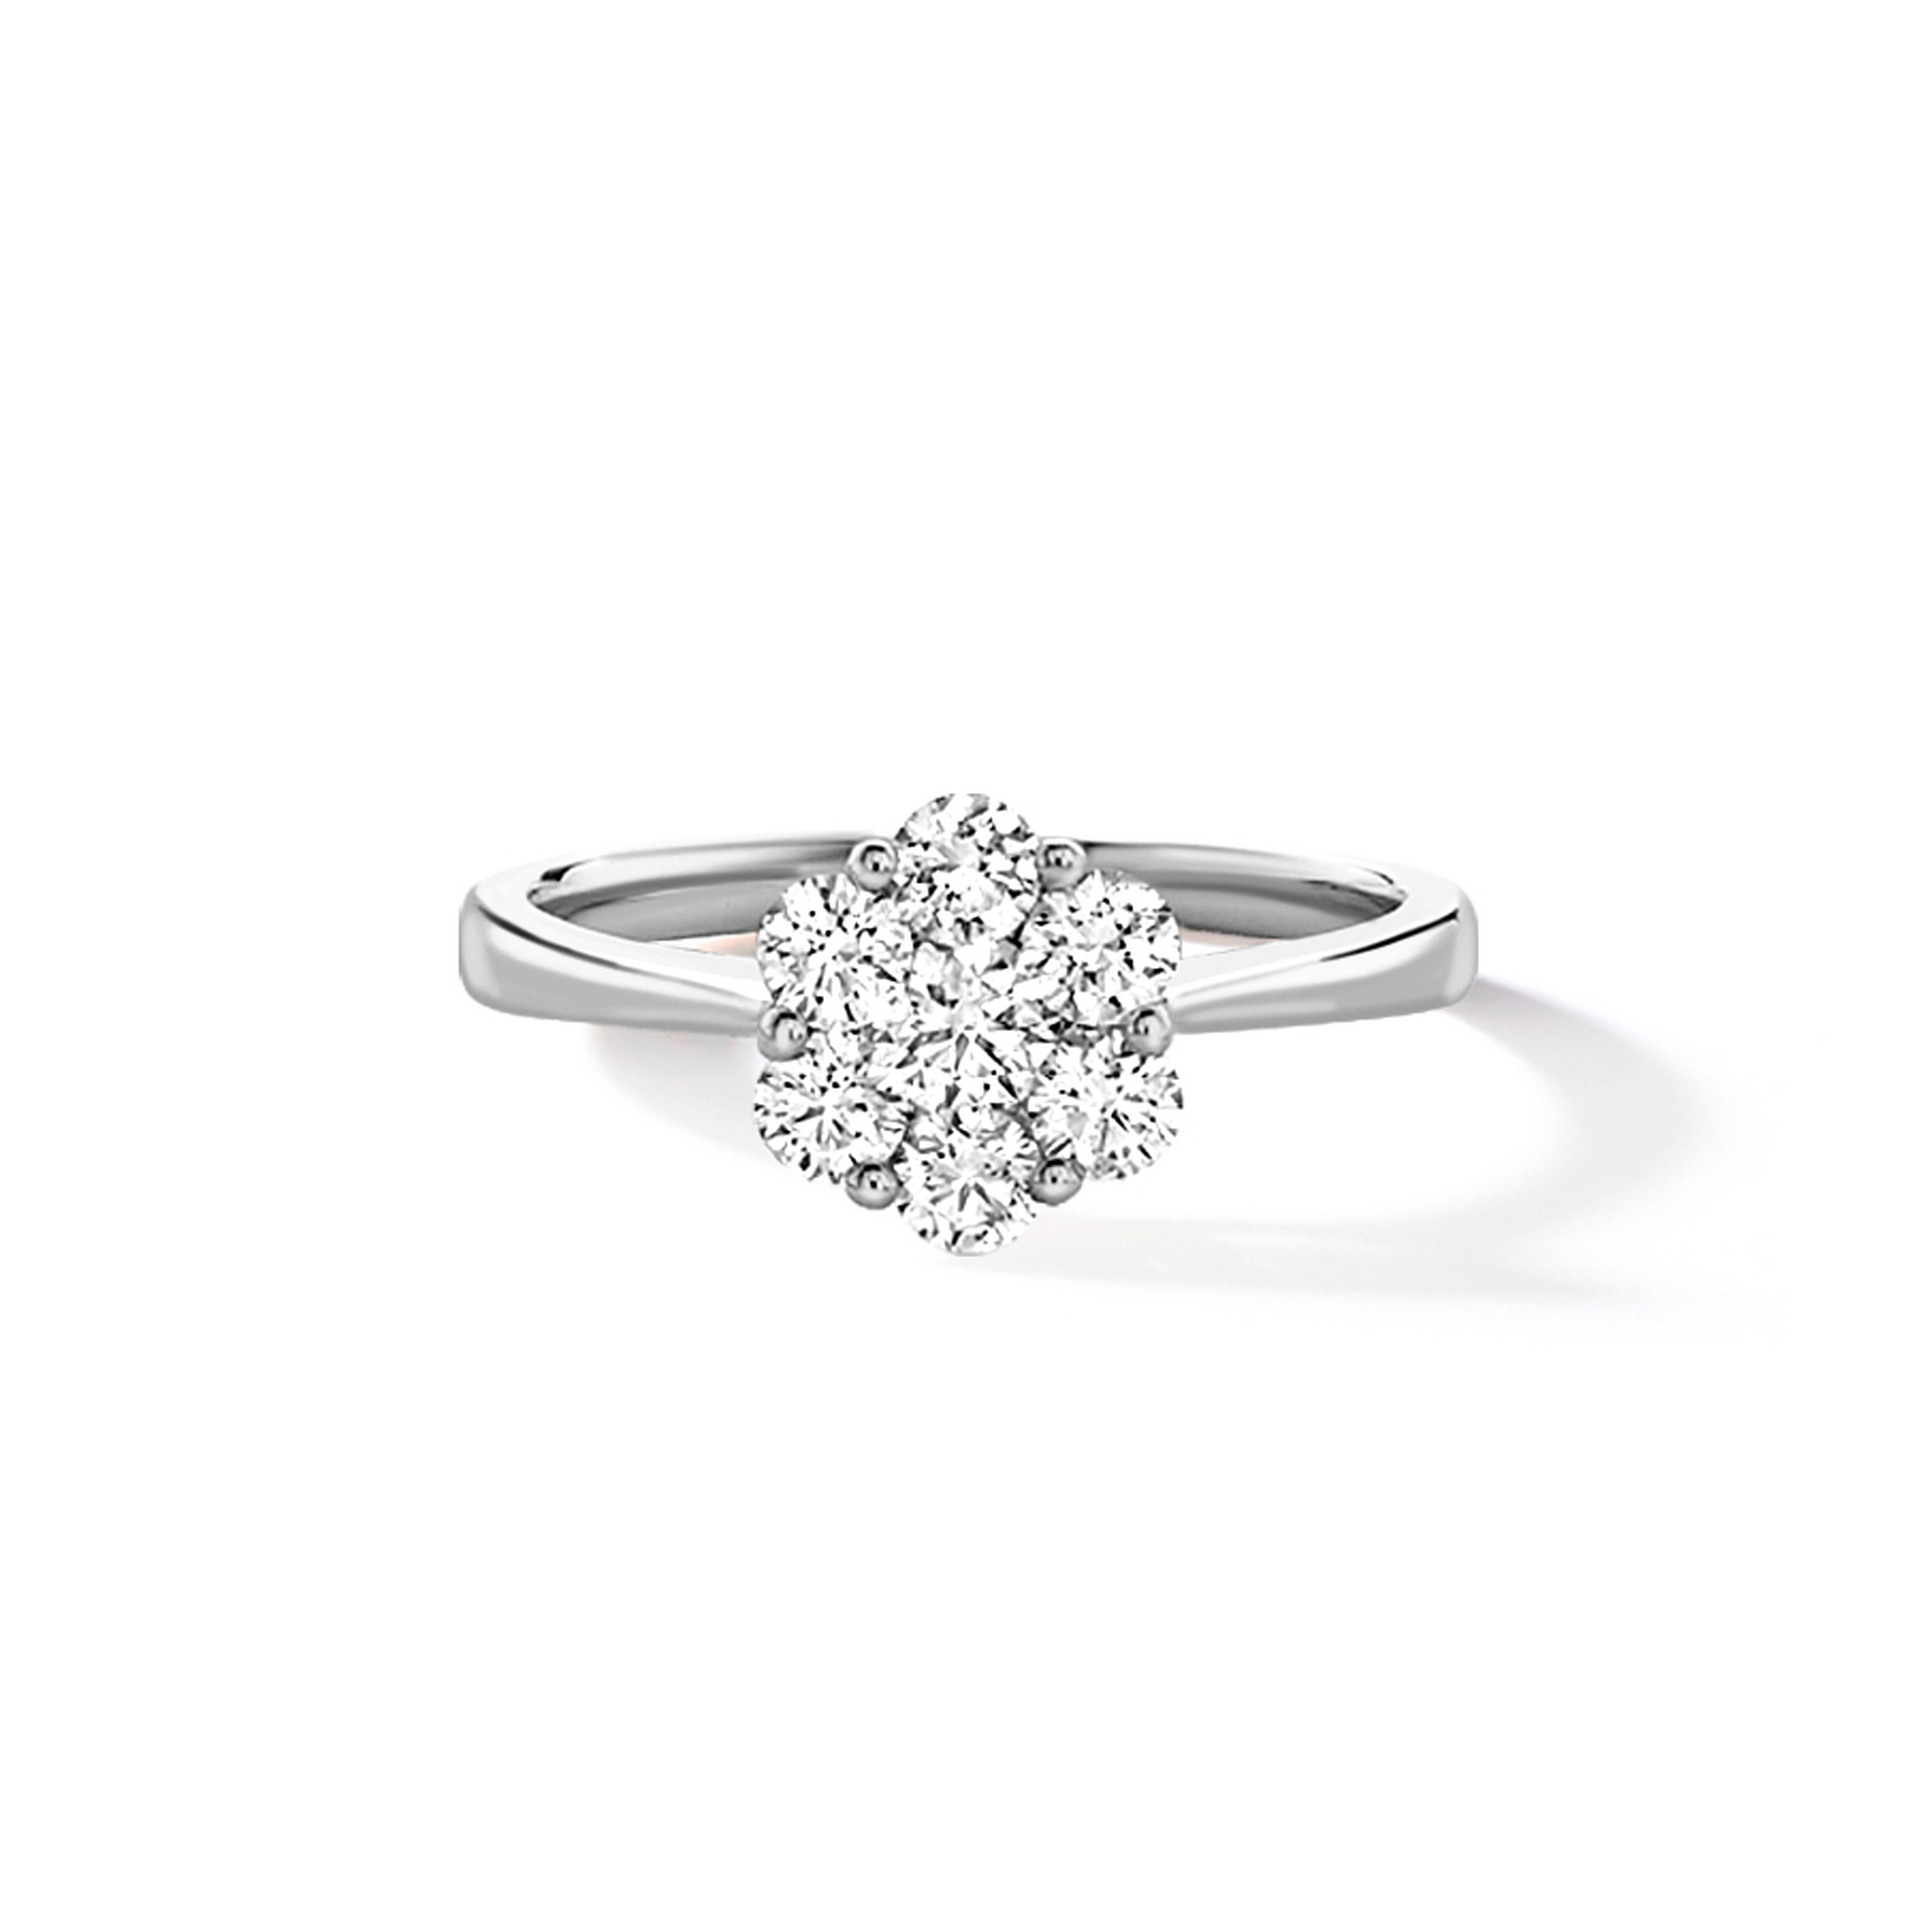 RUDELLS DAISY 18CT WHITE GOLD DIAMOND RING 1.00CT